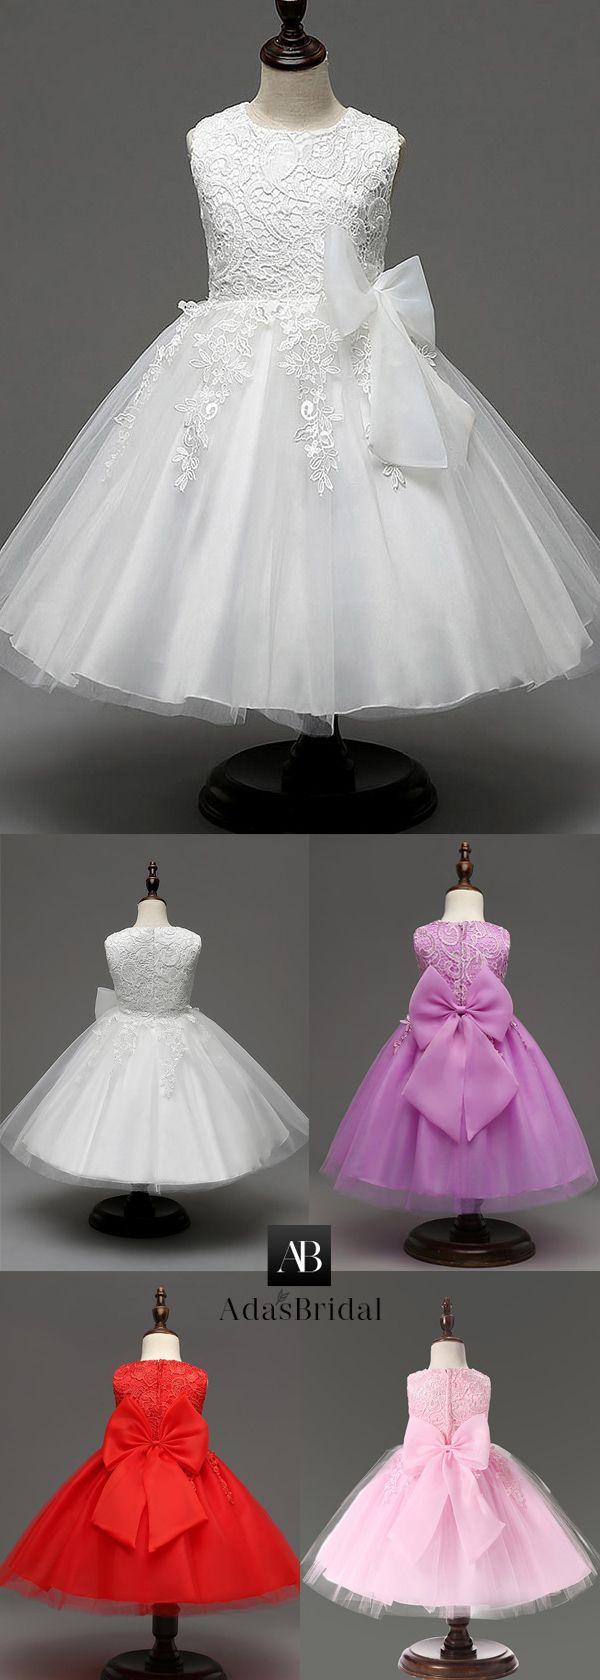 Eyecatching tulle u lace jewel neckline floorlength ball gown